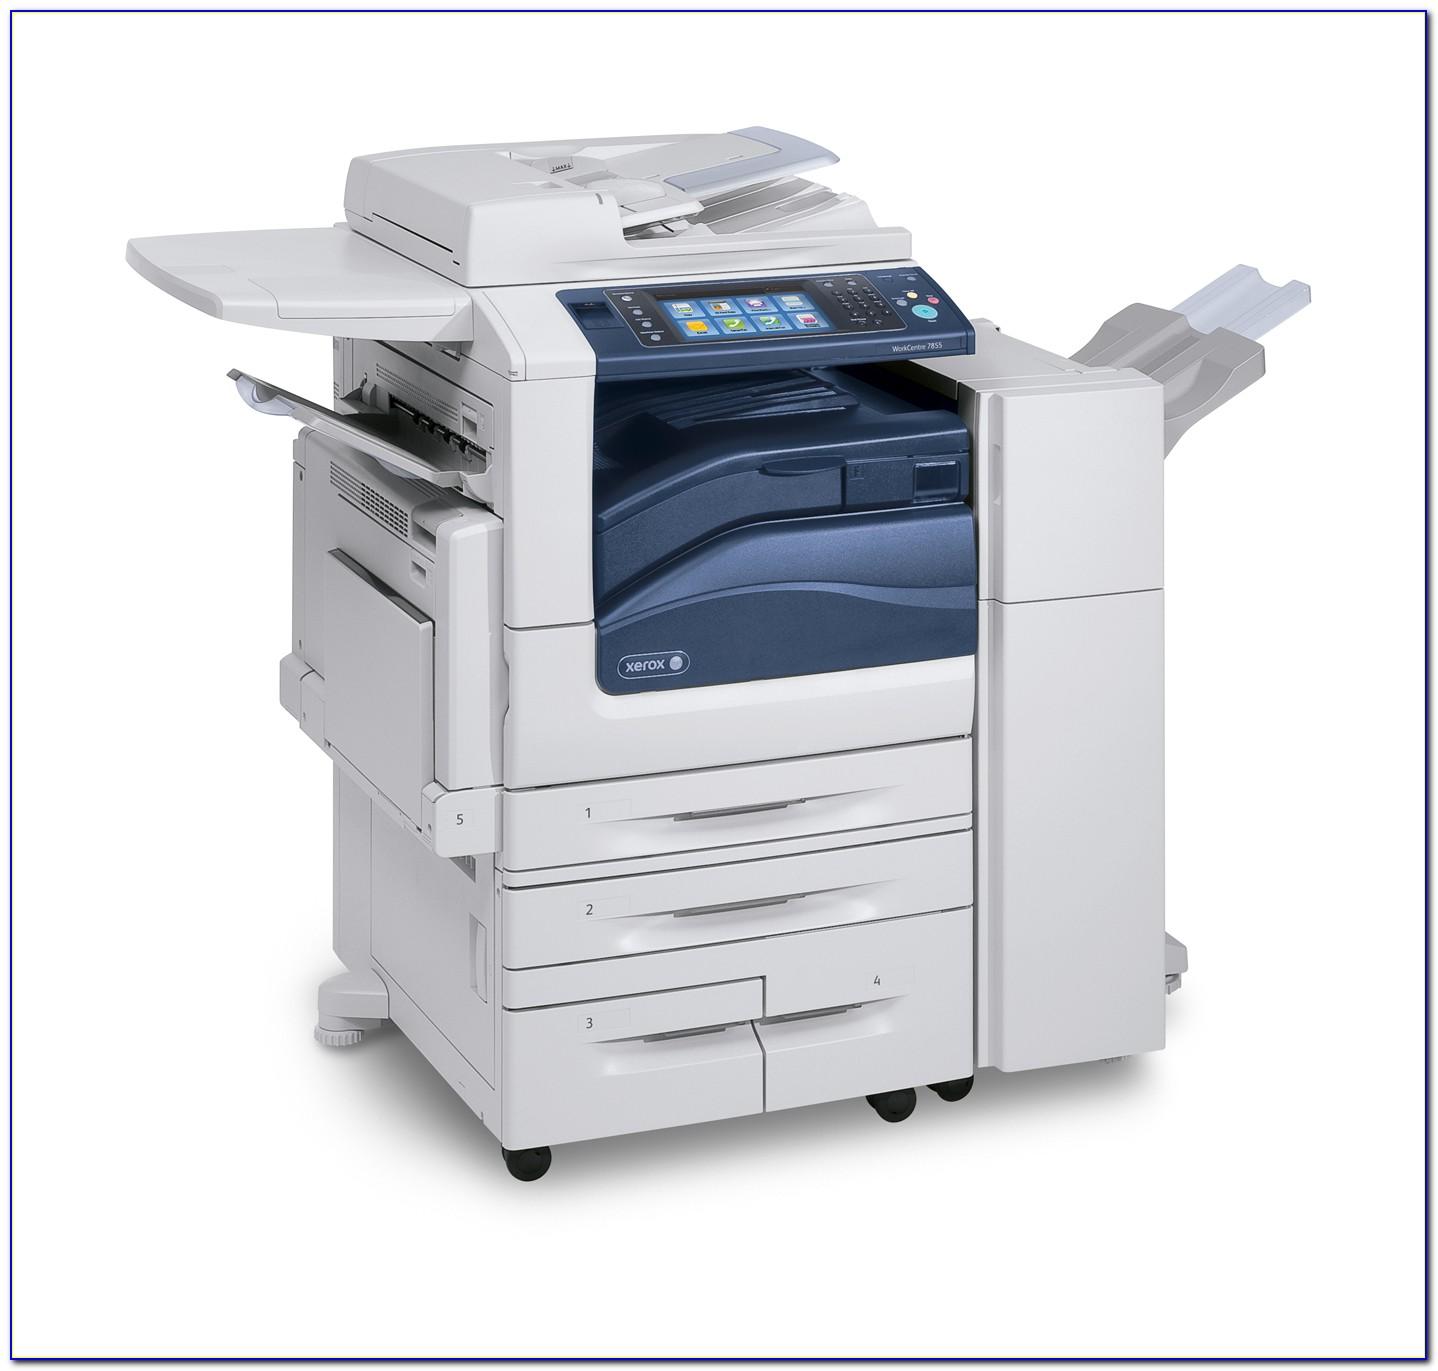 Xerox Wc 7835 Brochure